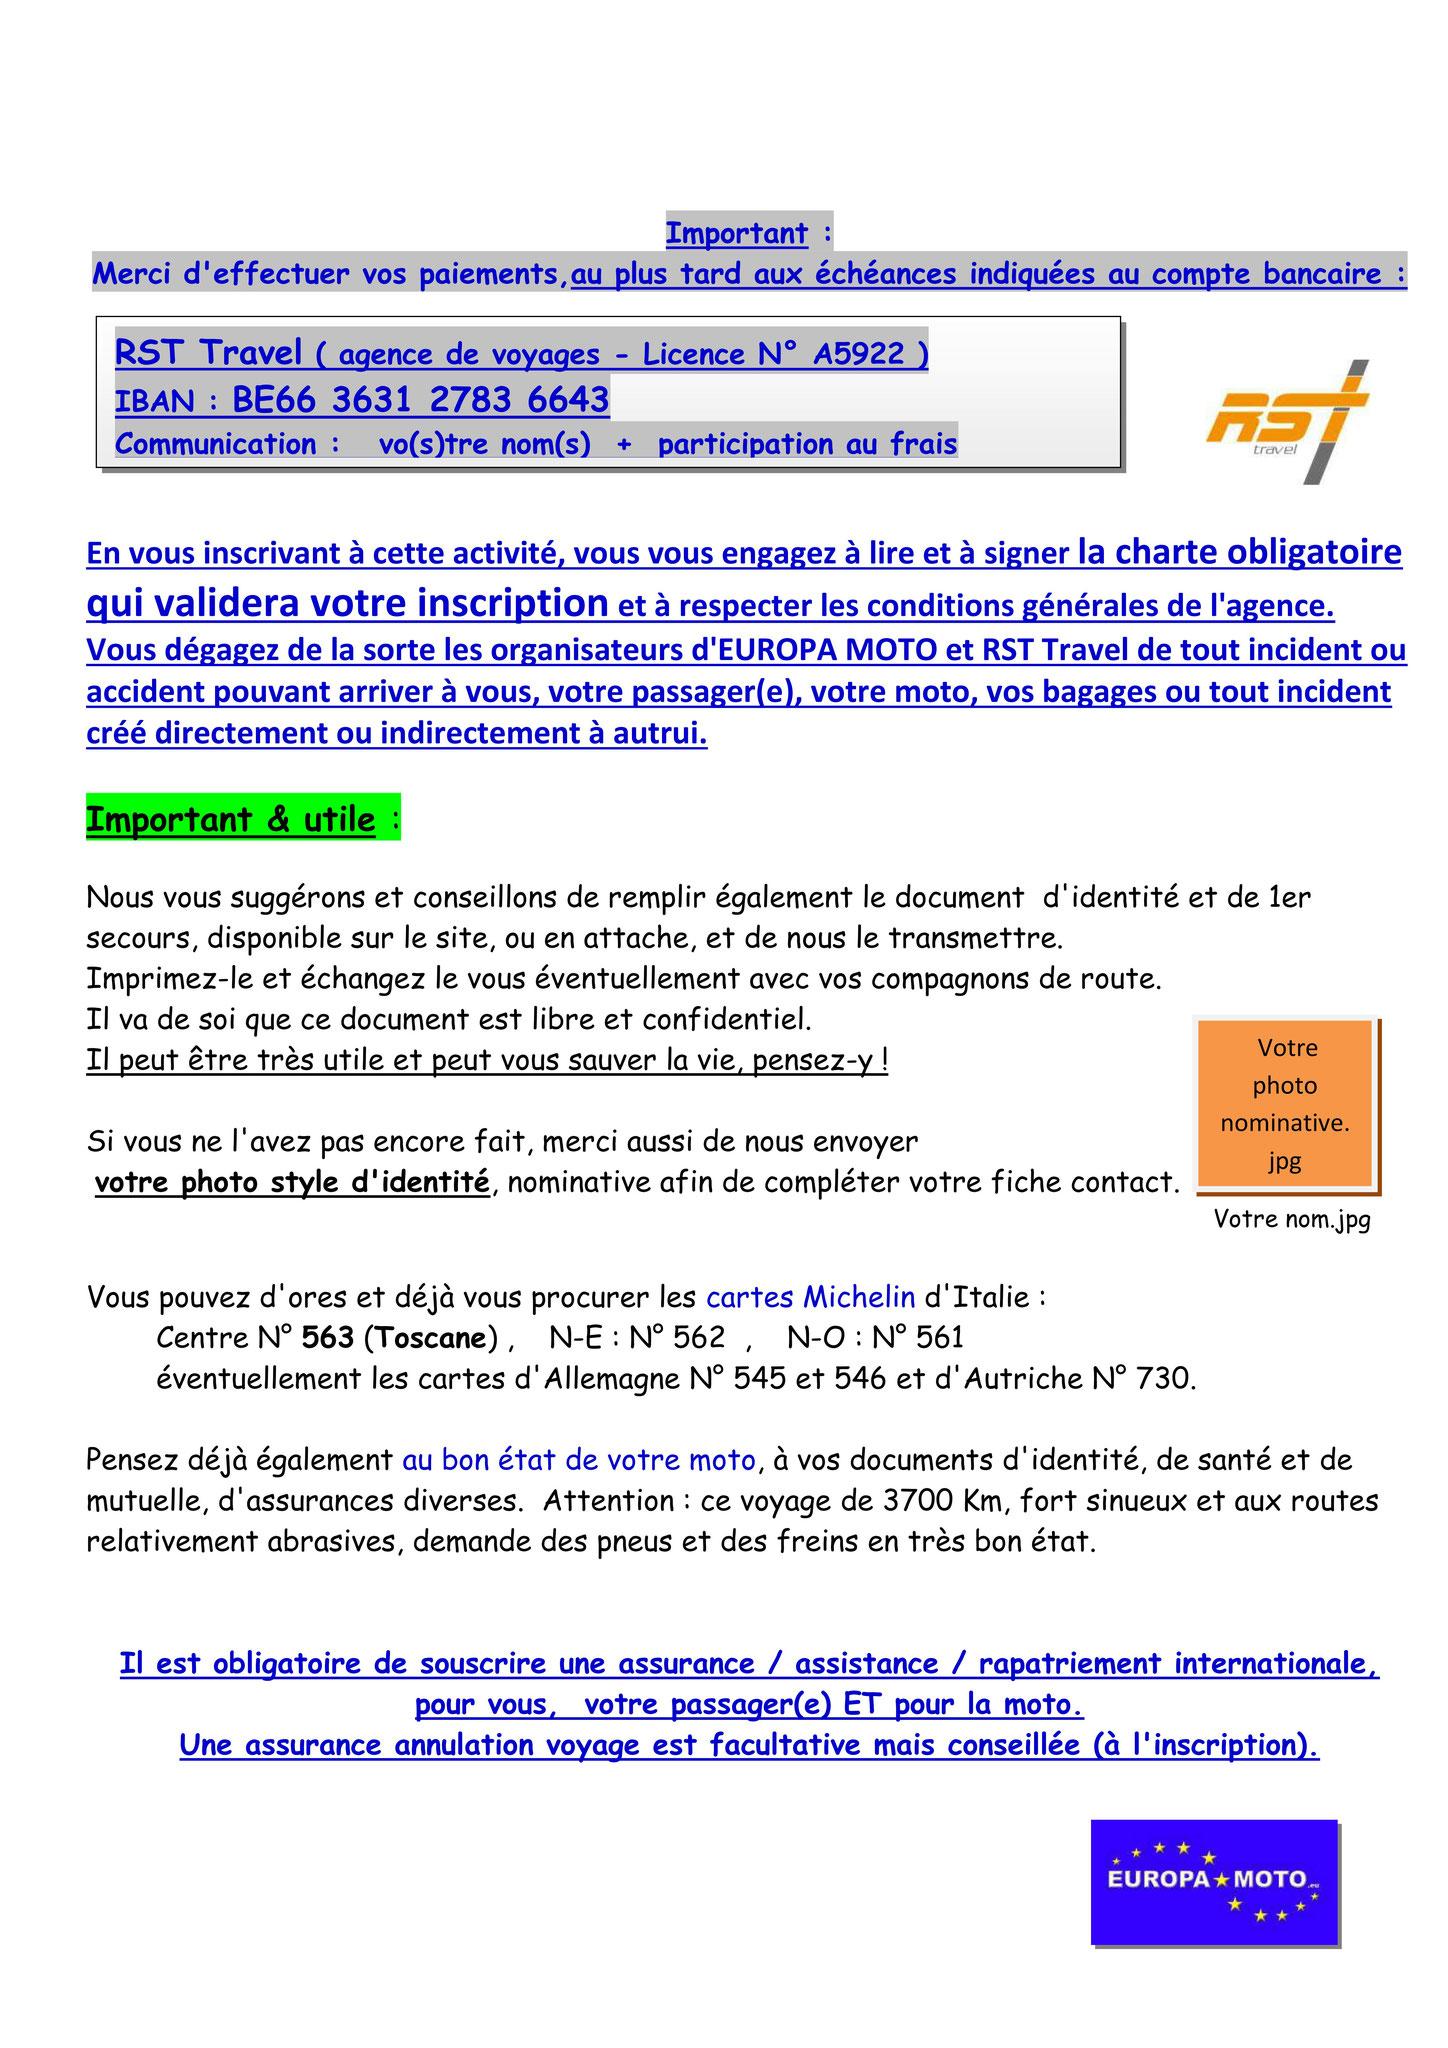 Invitation Toscane page 7